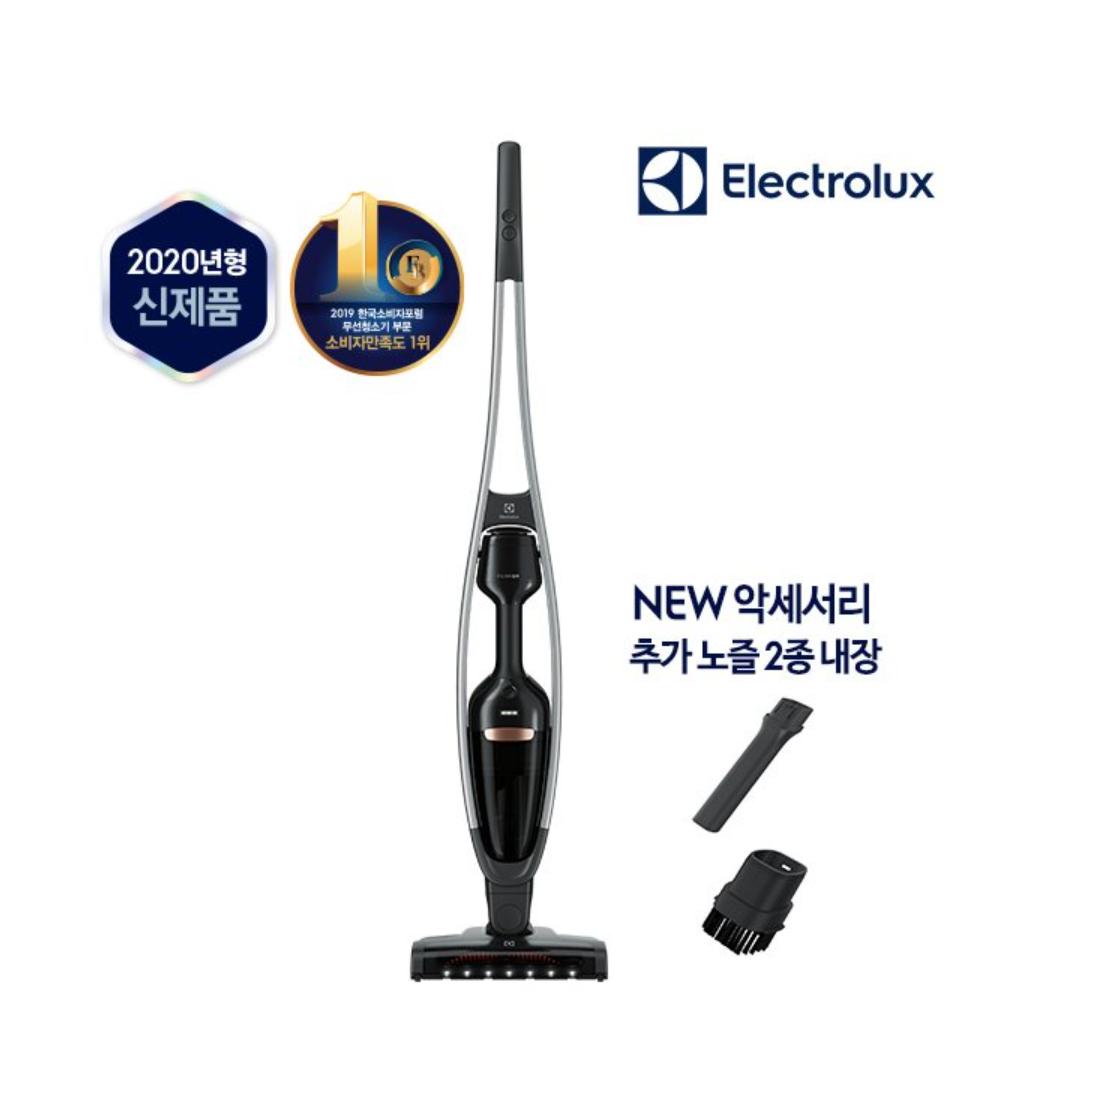 Electrolux Pure Q9 Power Pro Cordless Vacuum 일렉트로룩스 퓨어 파워프로 청소기 스틱청소기